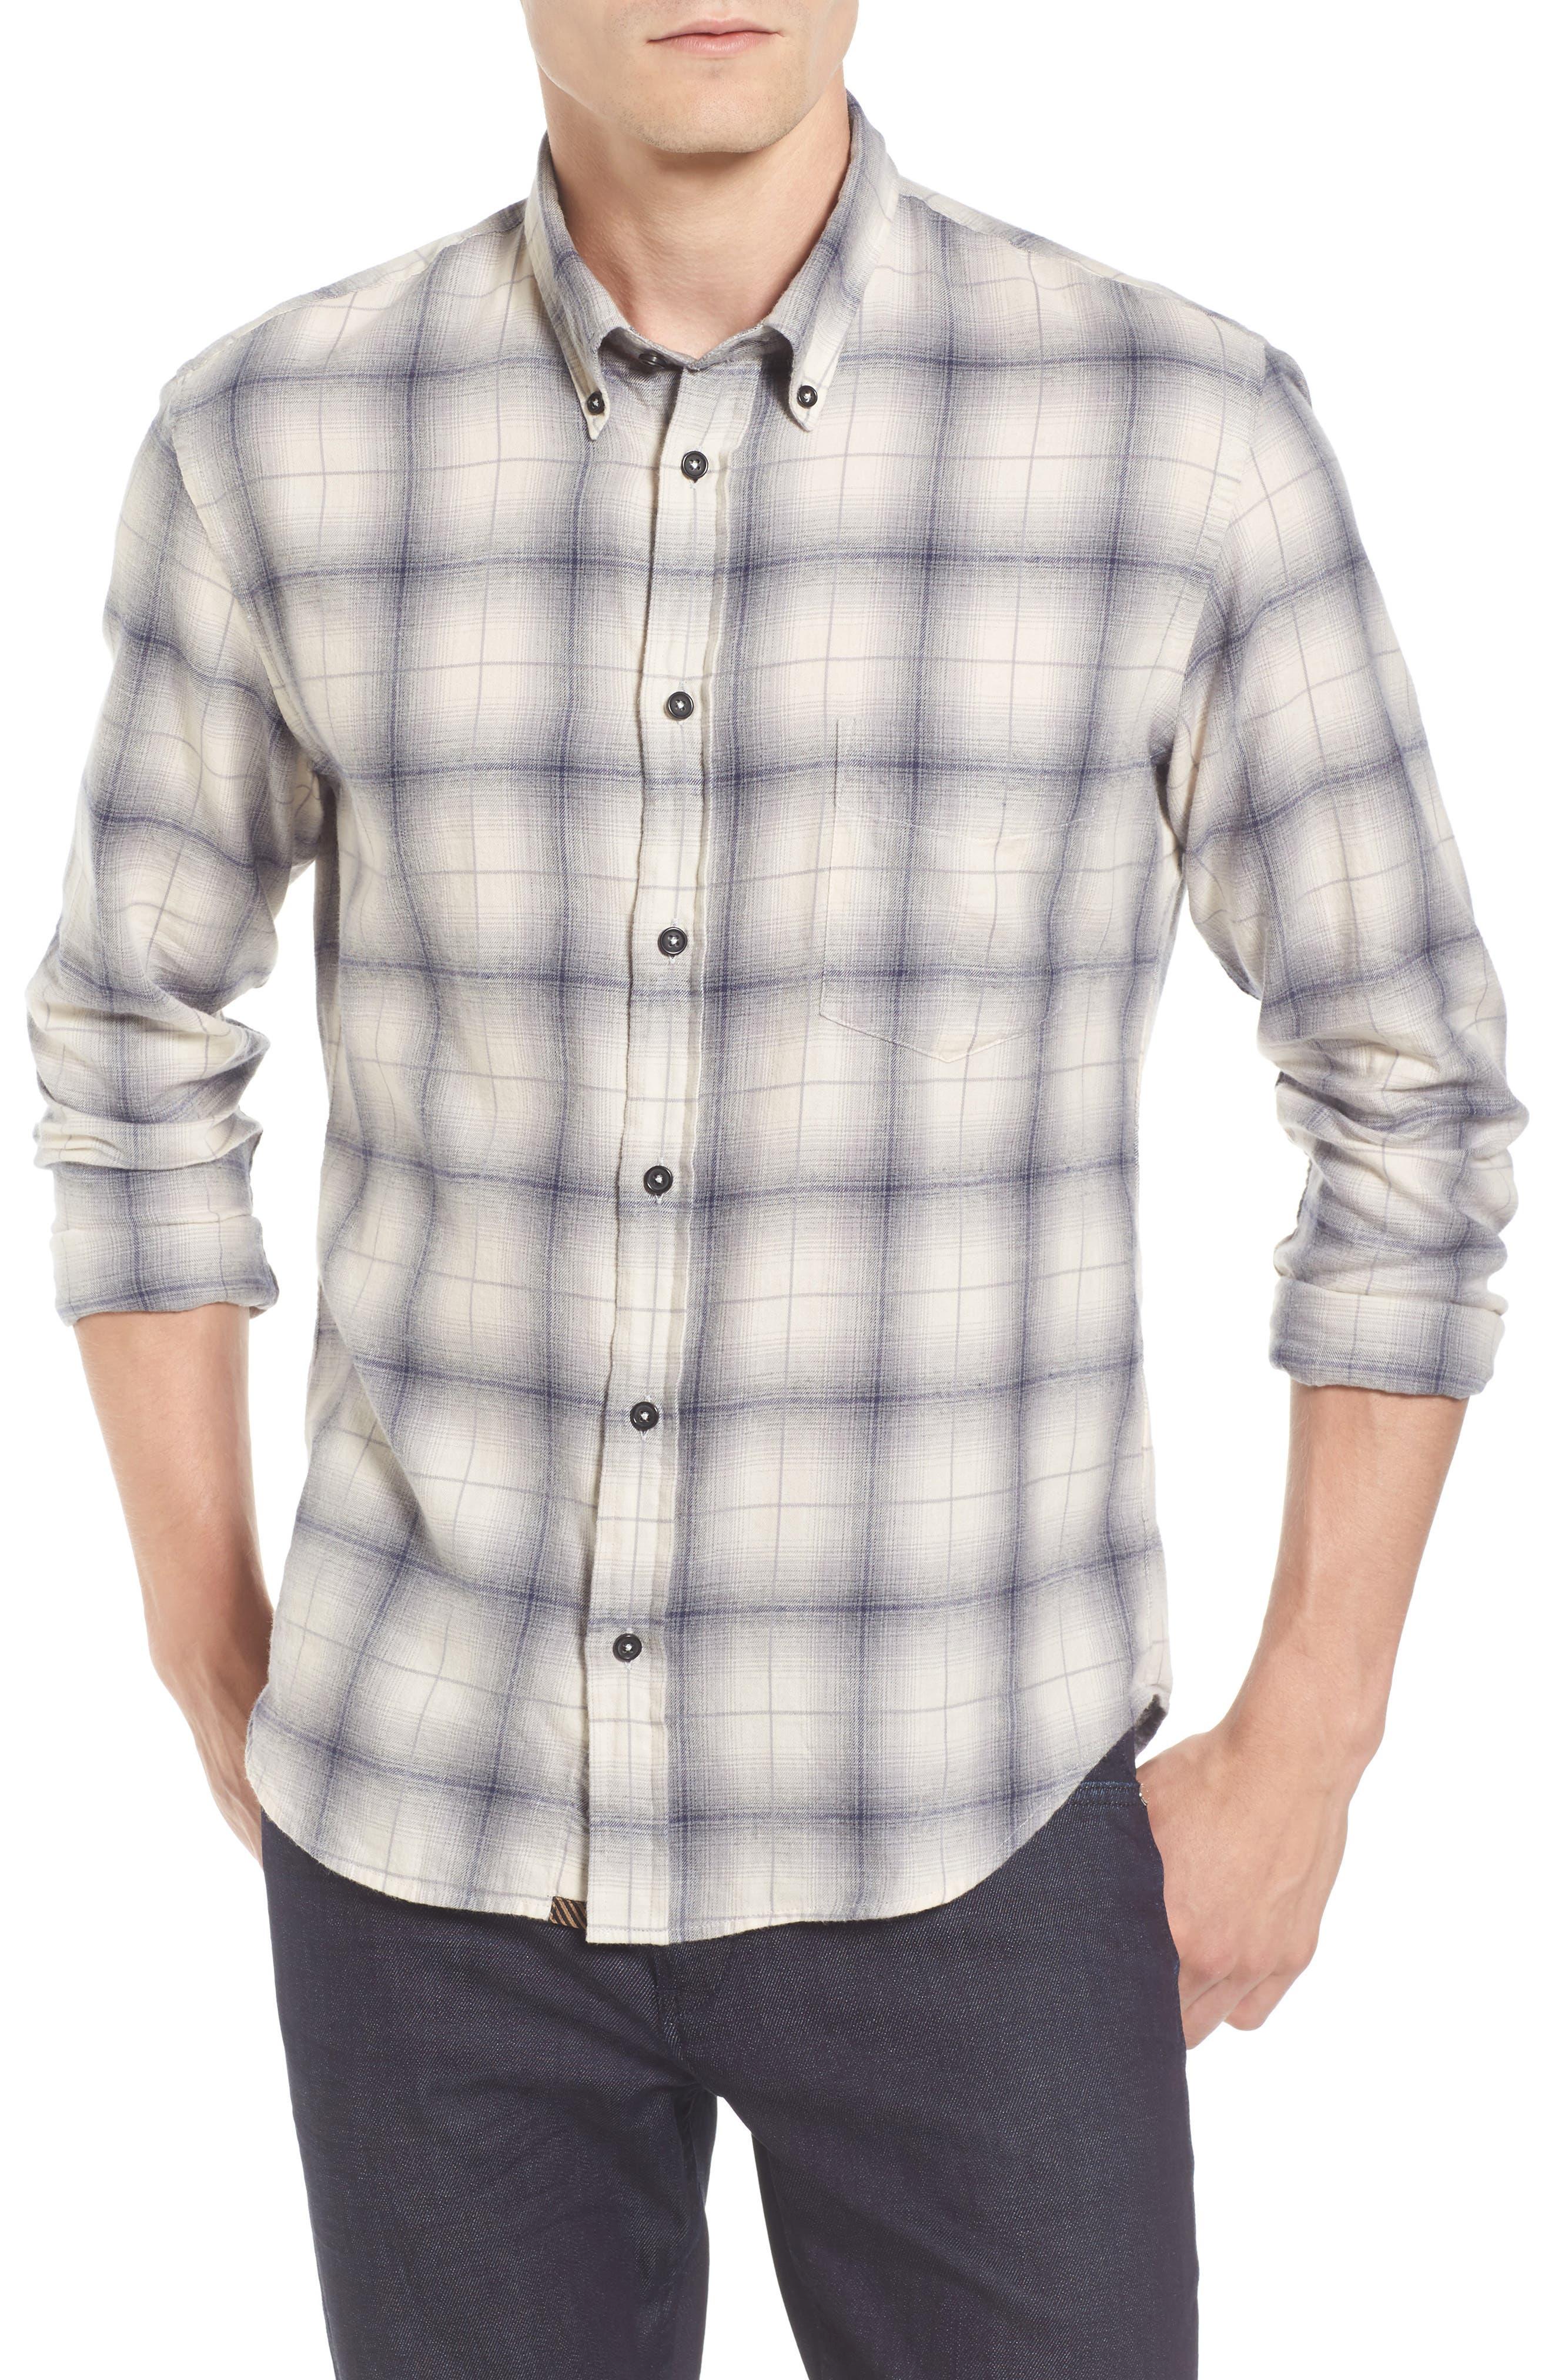 Kirby Slim Fit Plaid Flannel Shirt,                             Main thumbnail 1, color,                             Grey/ Blue